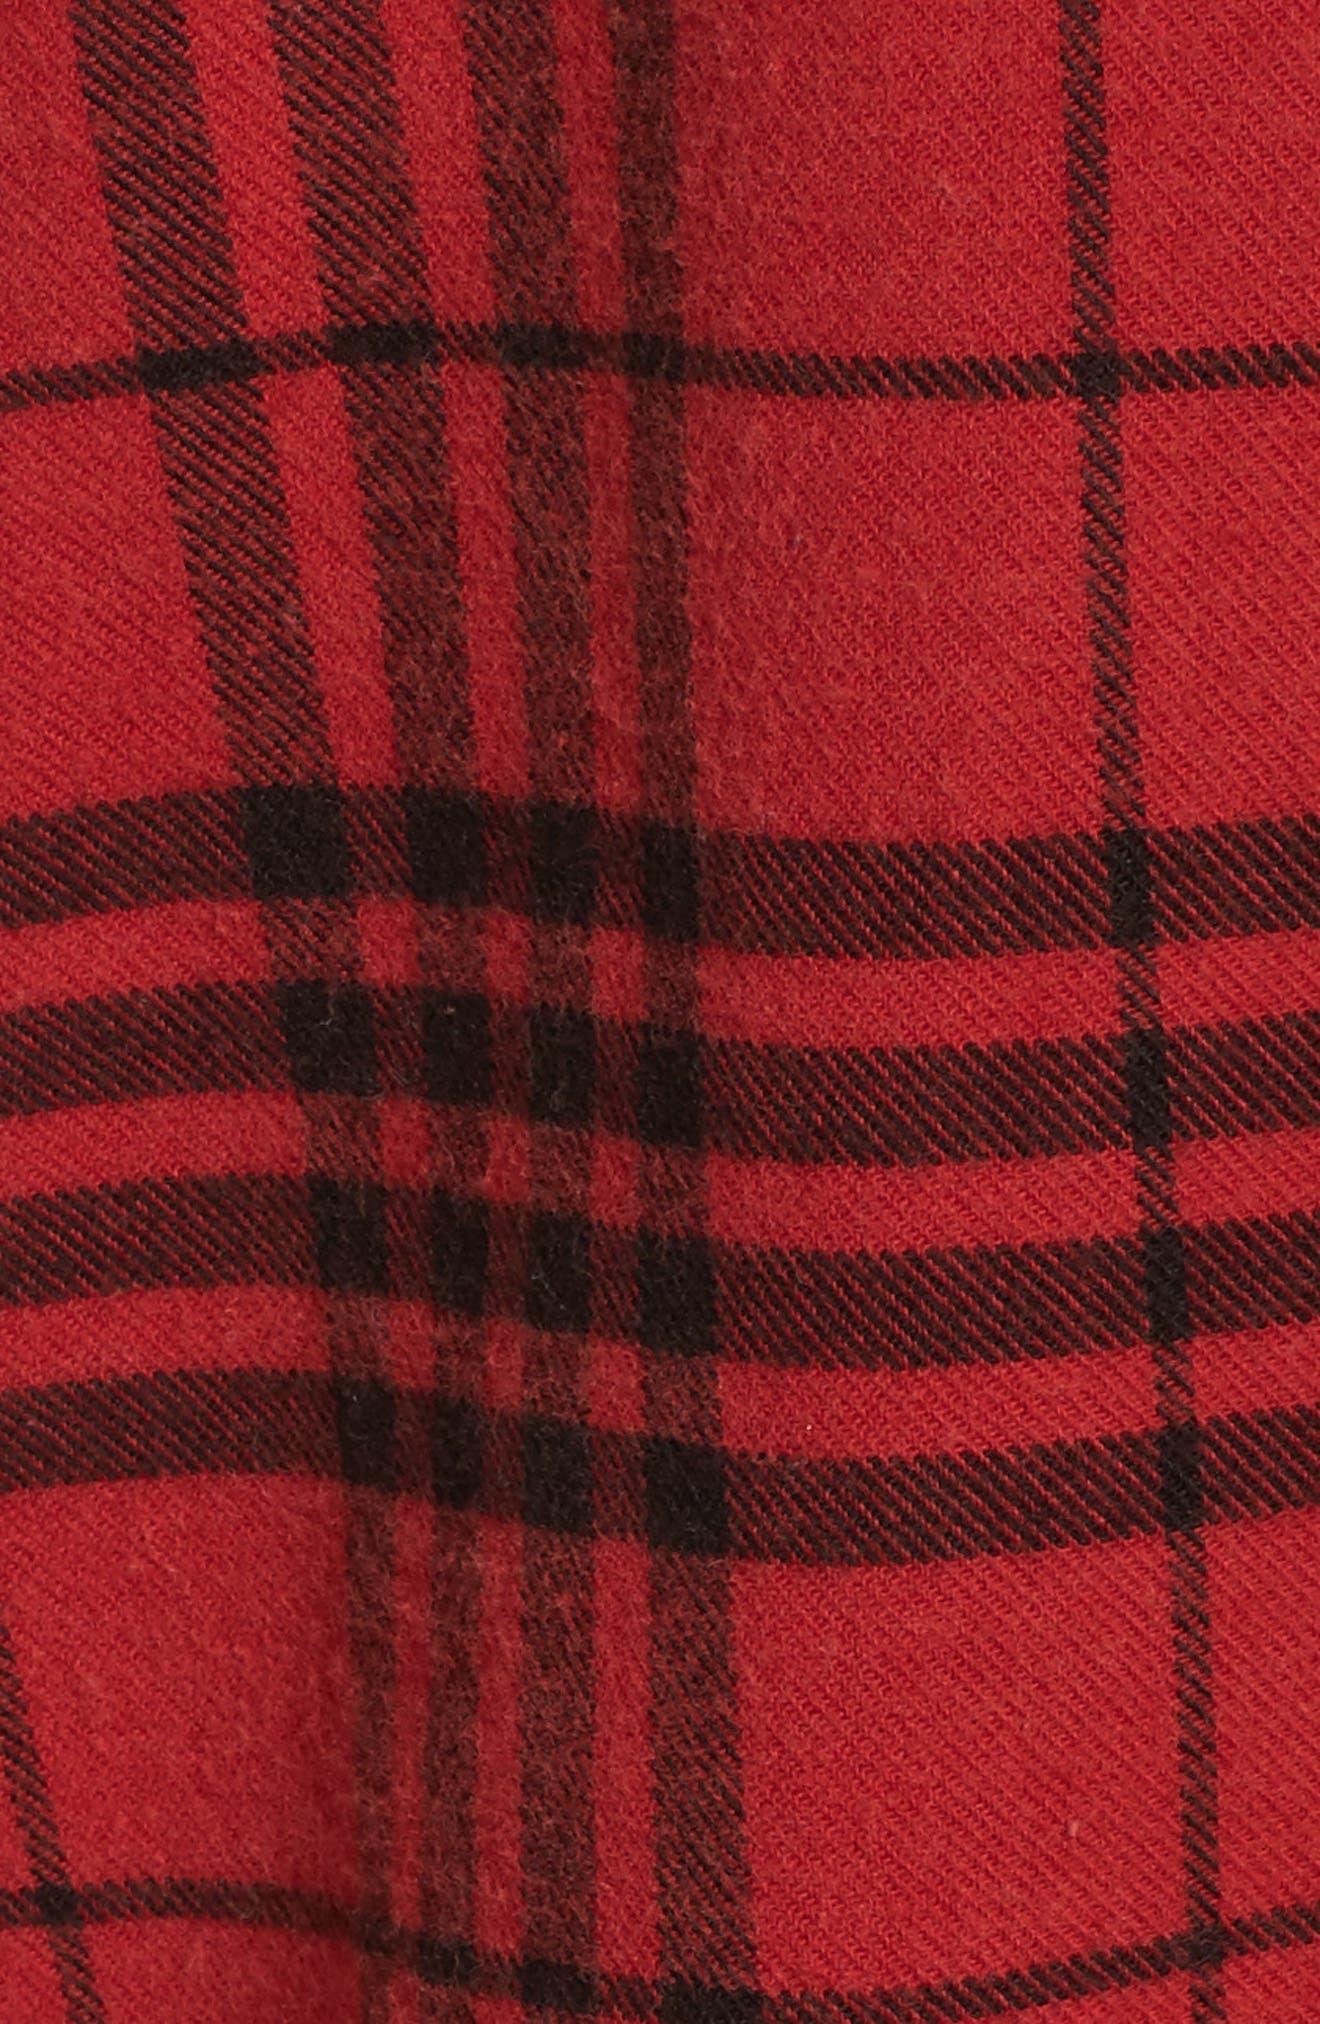 Plaid Cotton Blend Nightshirt,                             Alternate thumbnail 44, color,